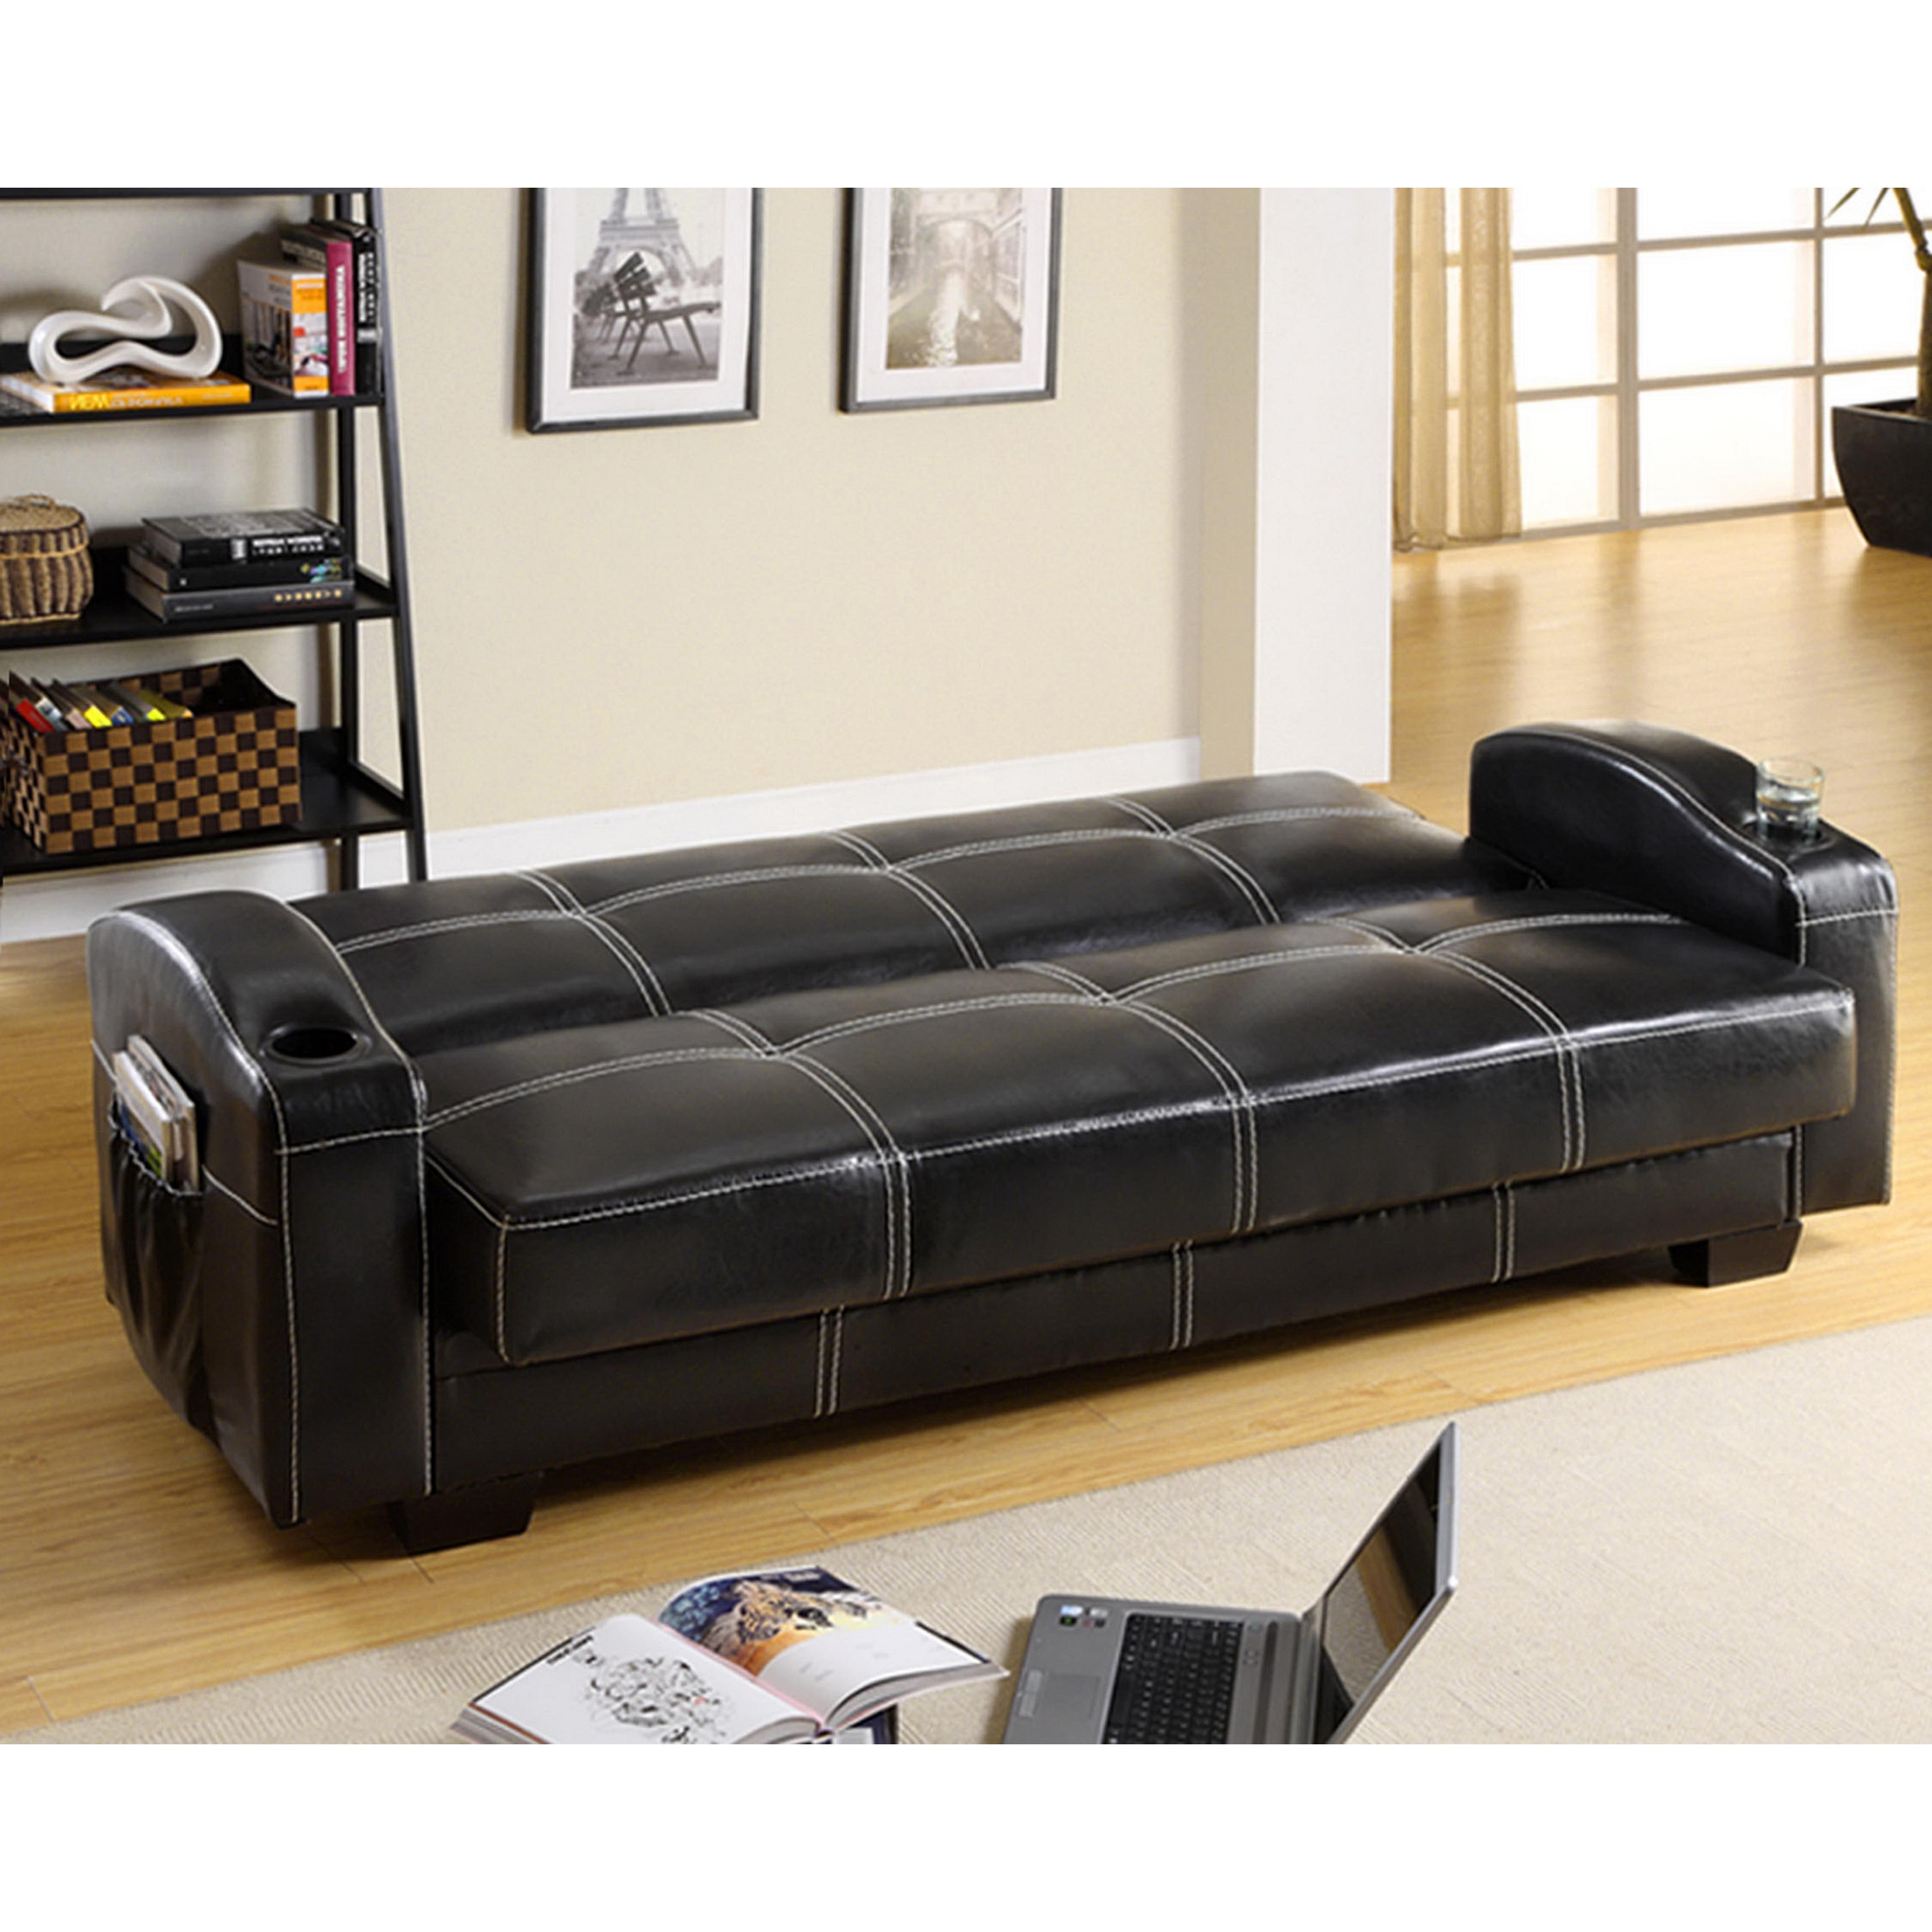 Furniture of America Max Multi functional Futon Sleeper Sofa with